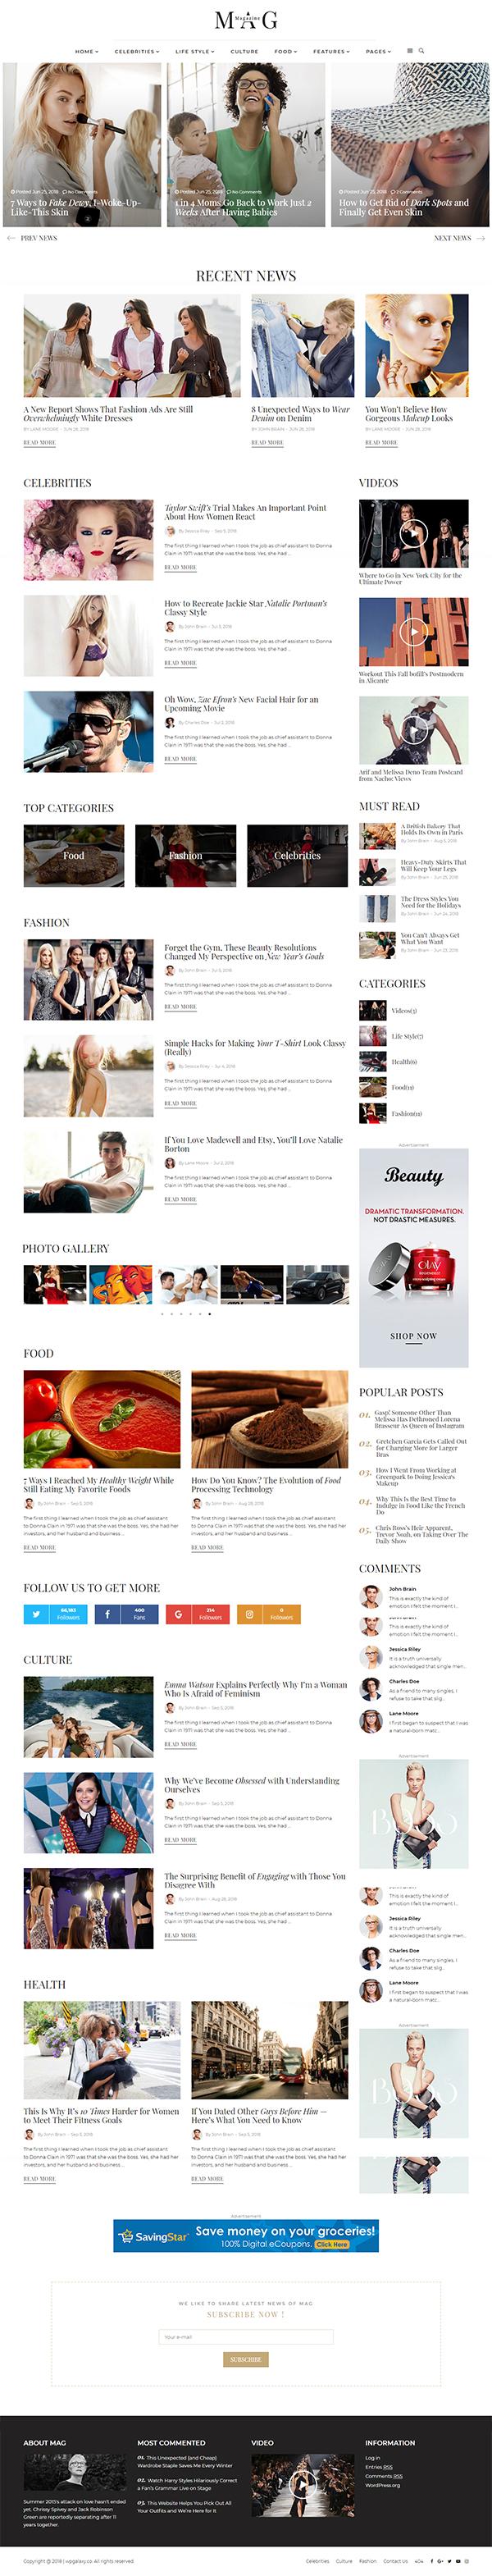 MAG - Blog & Fashion Magazine